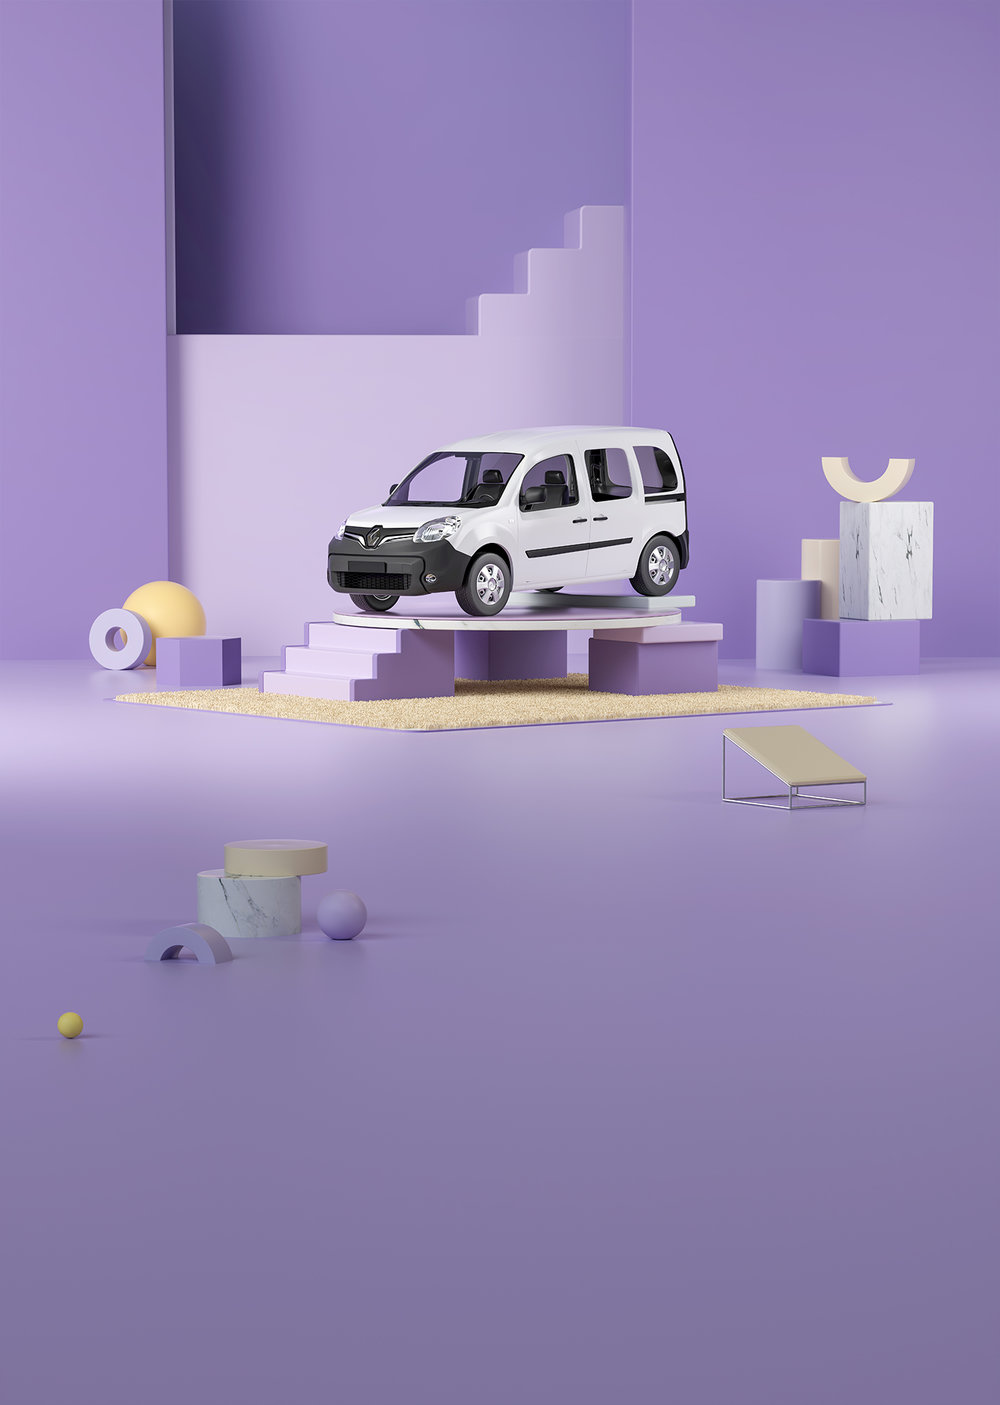 Cars_bankia_Toyota_Yaris_02__12.jpg